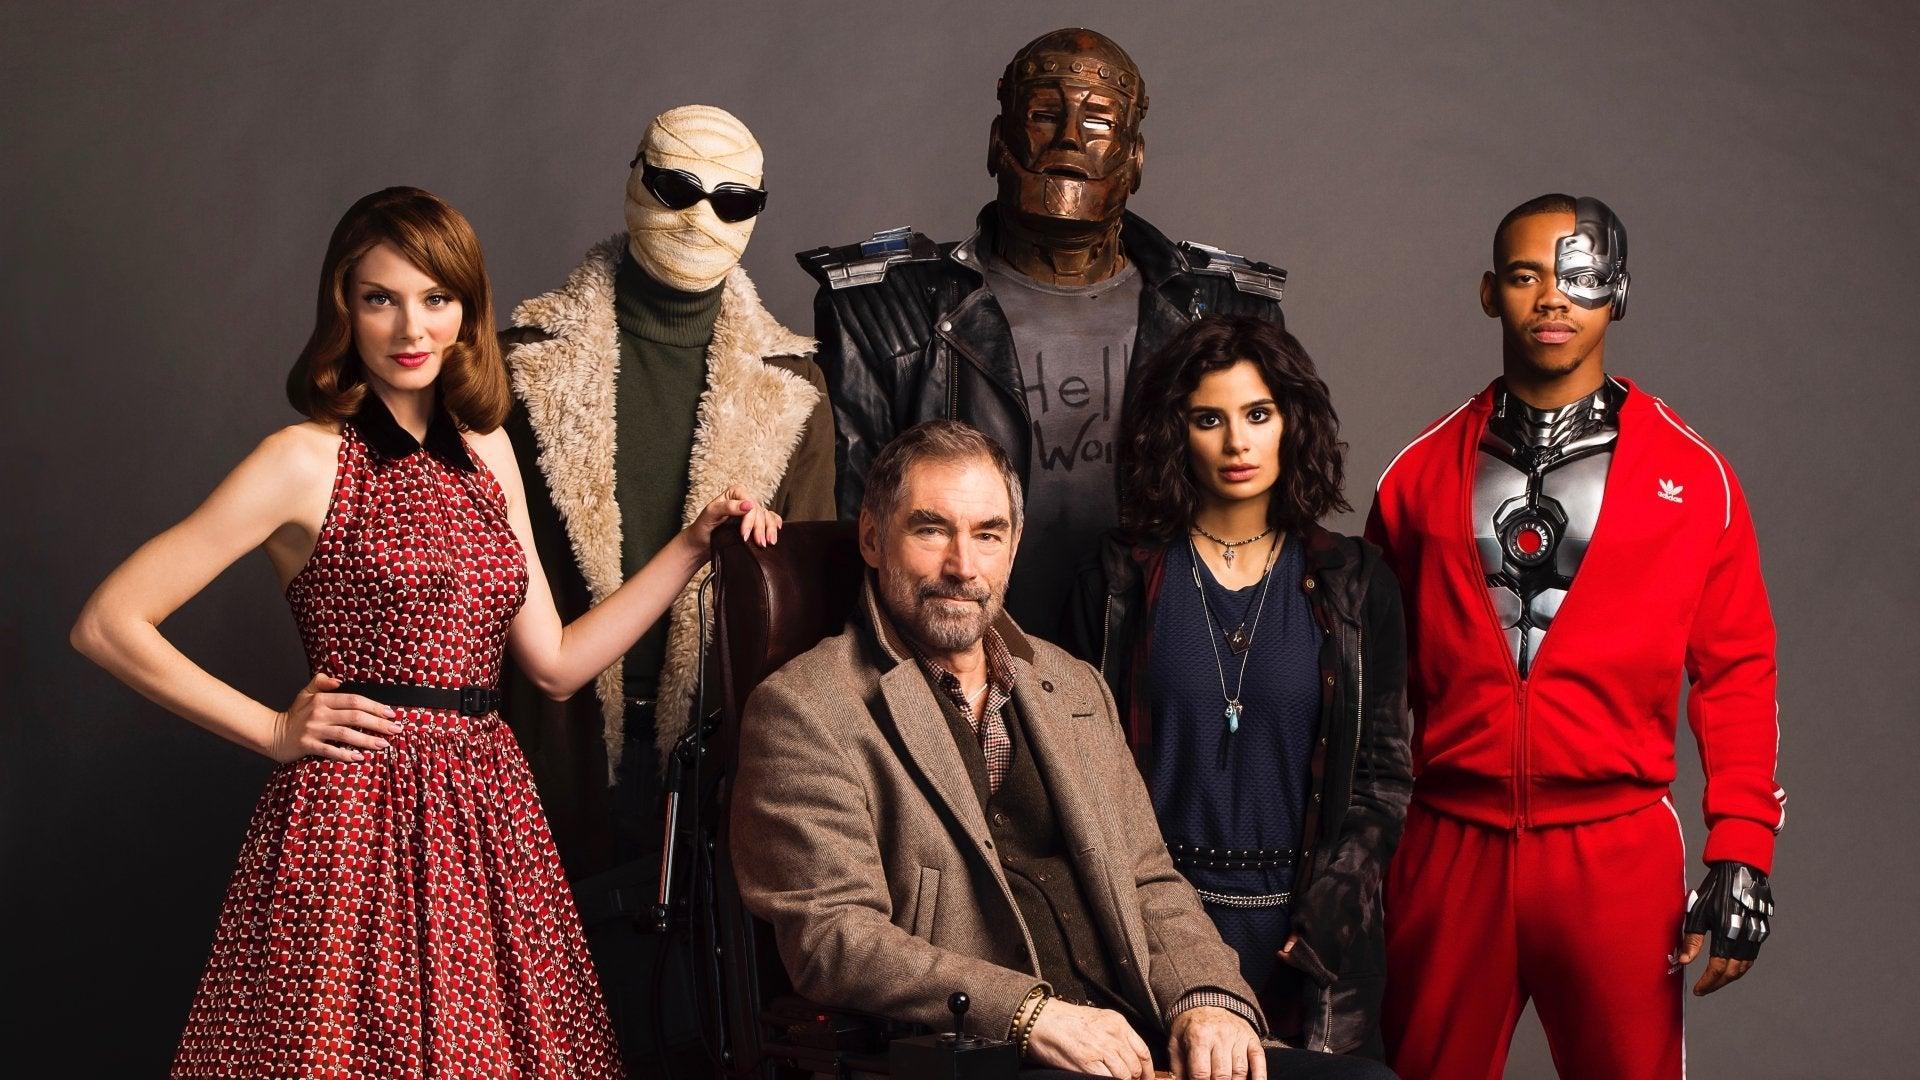 The cast of Doom Patrol, HBO series, 2020